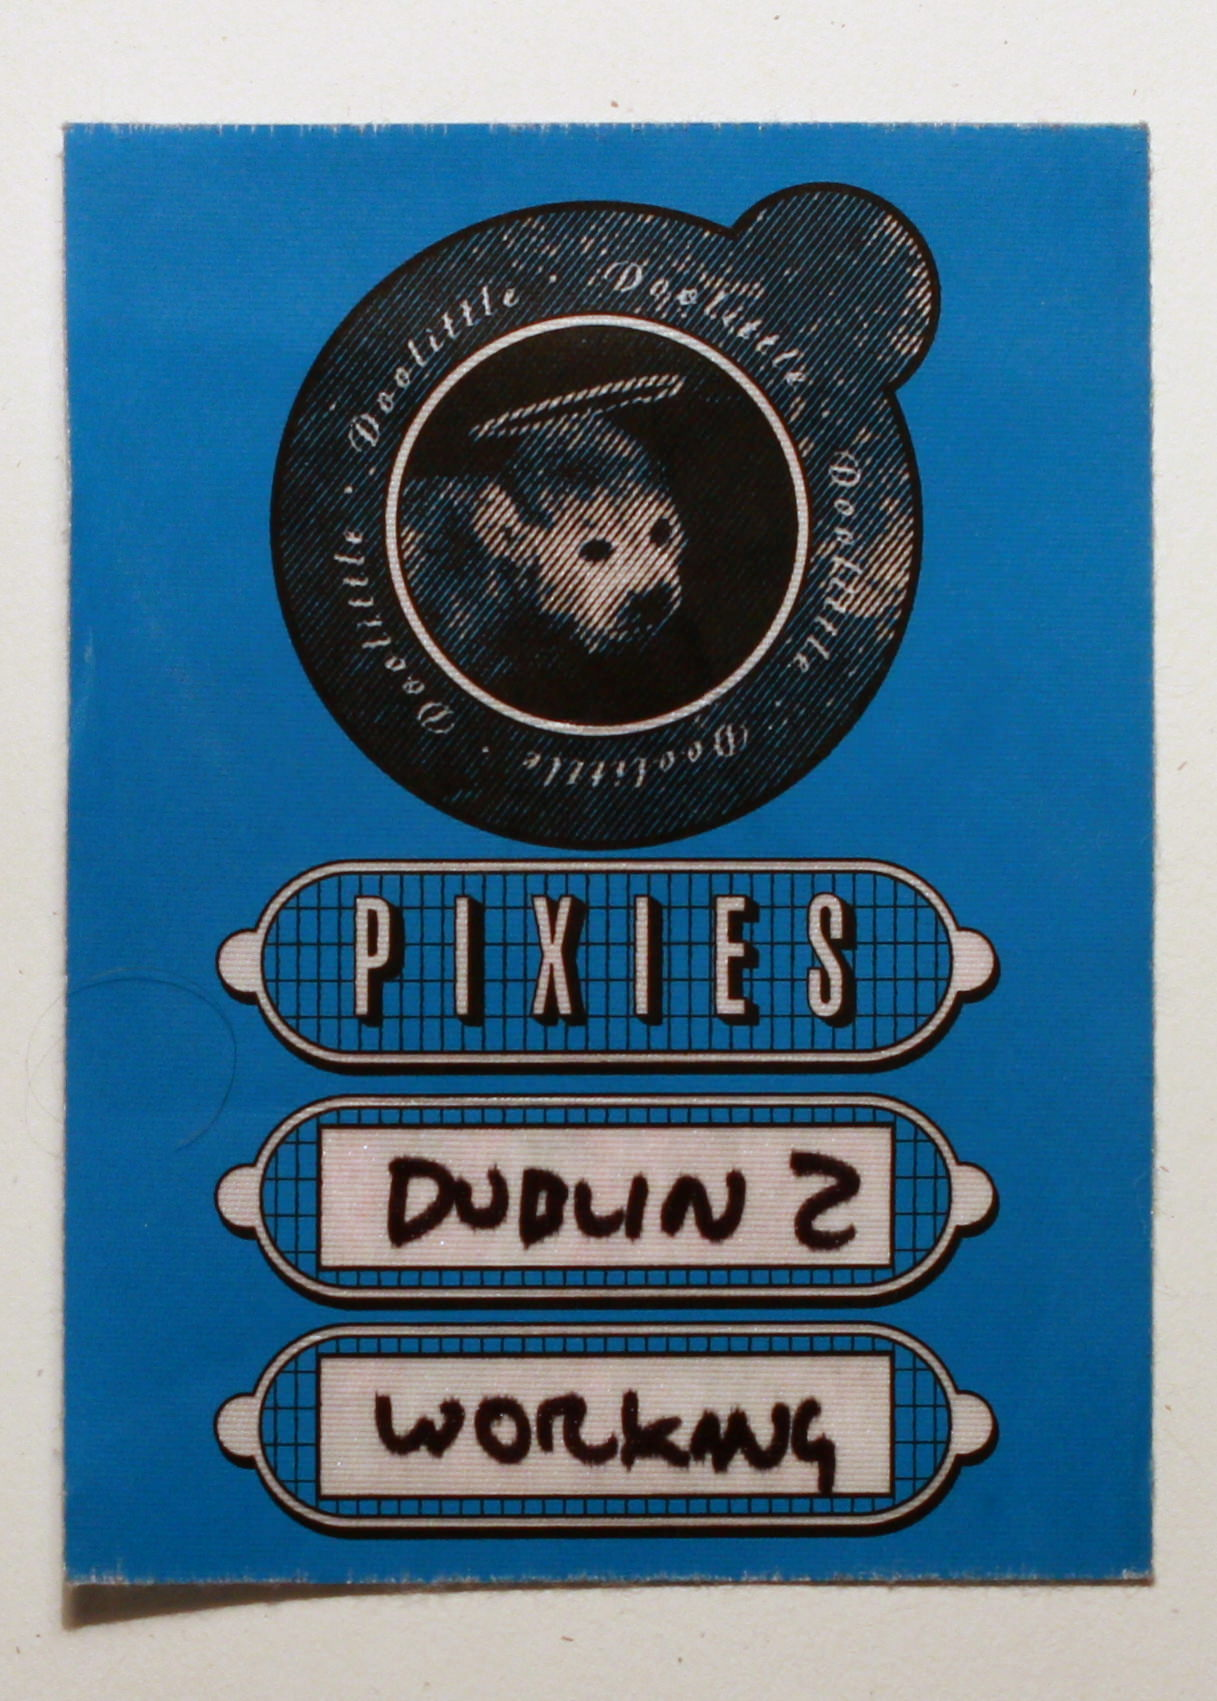 Pixies Pass.jpg